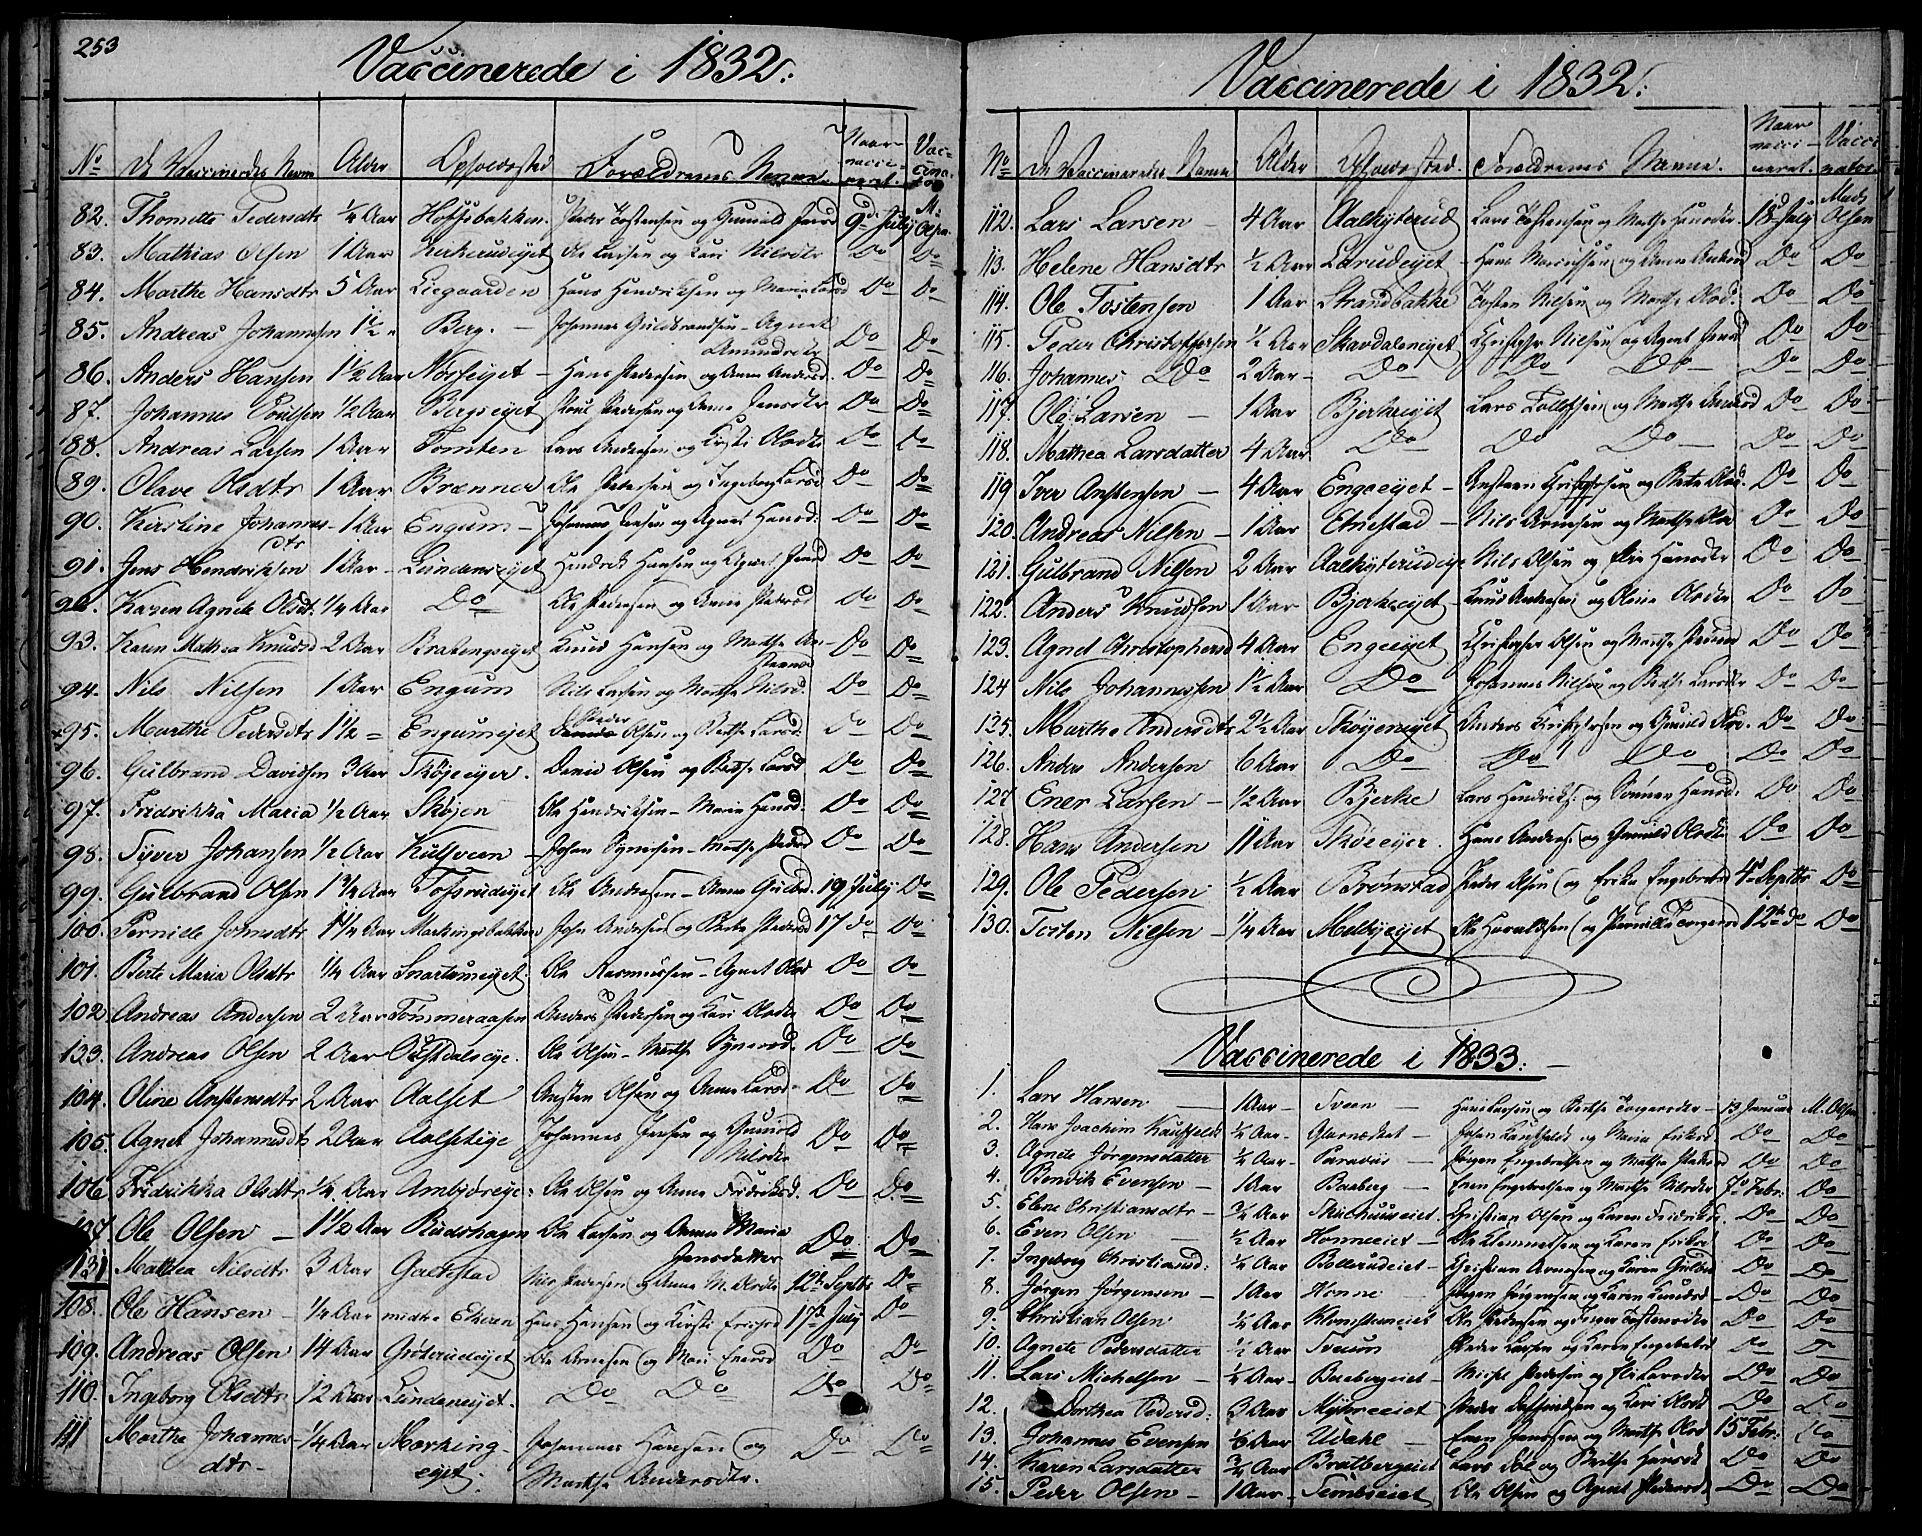 SAH, Biri prestekontor, Ministerialbok nr. 4, 1829-1842, s. 253